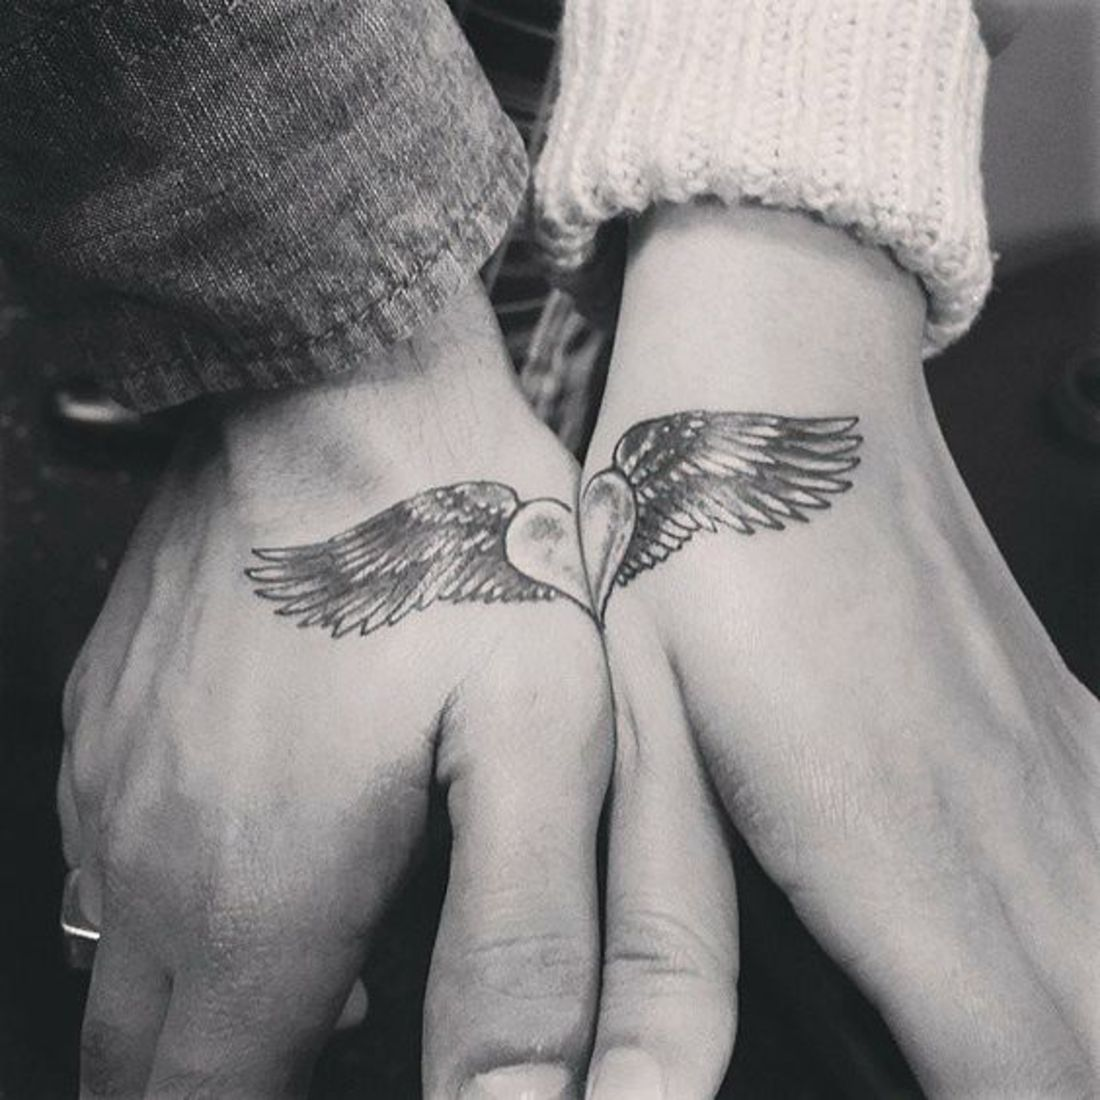 1001 Ideas Y Consejos De Tatuajes Para Parejas Tatuajes Av